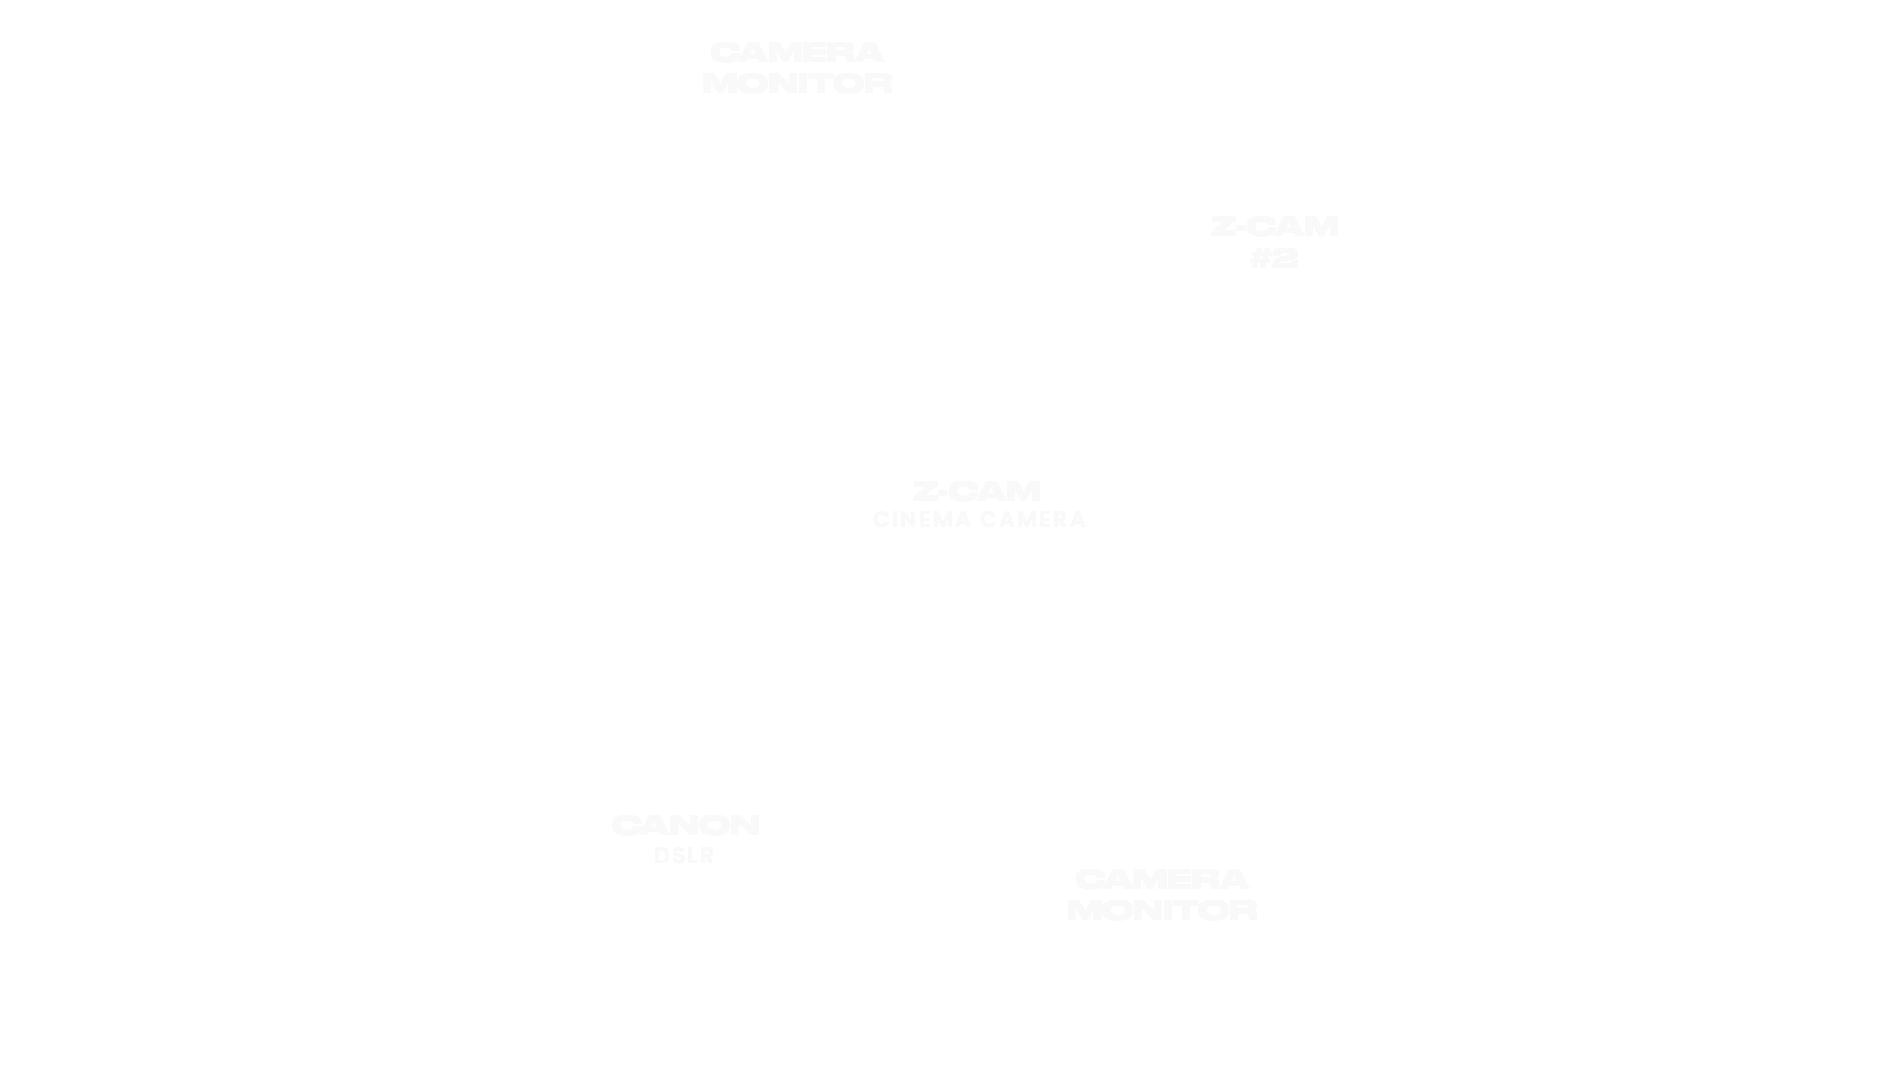 SFCM Gear Details